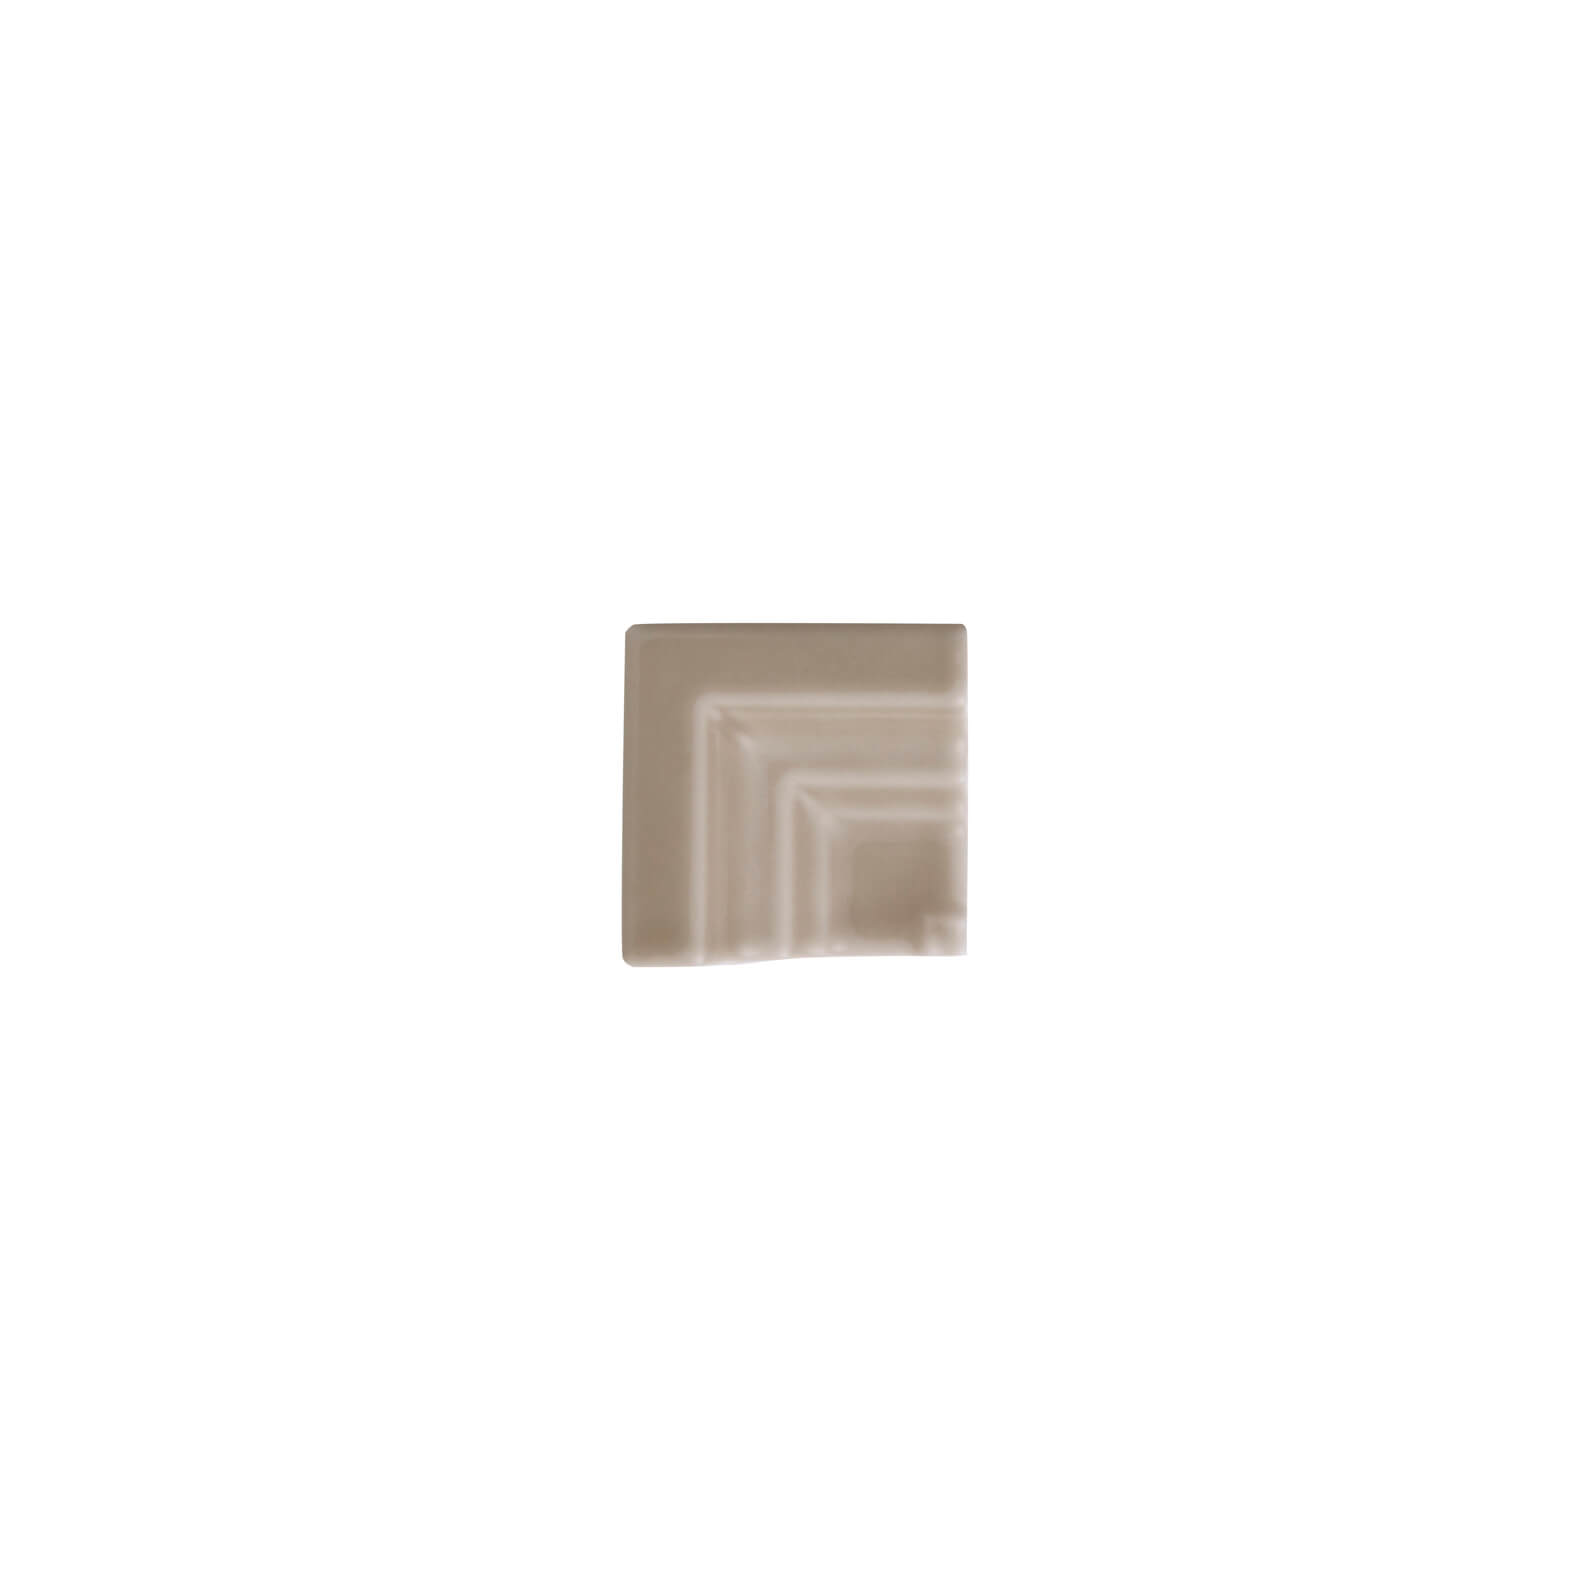 ADST5295 - ANGULO MARCO CORNISA - 5 cm X 19.8 cm